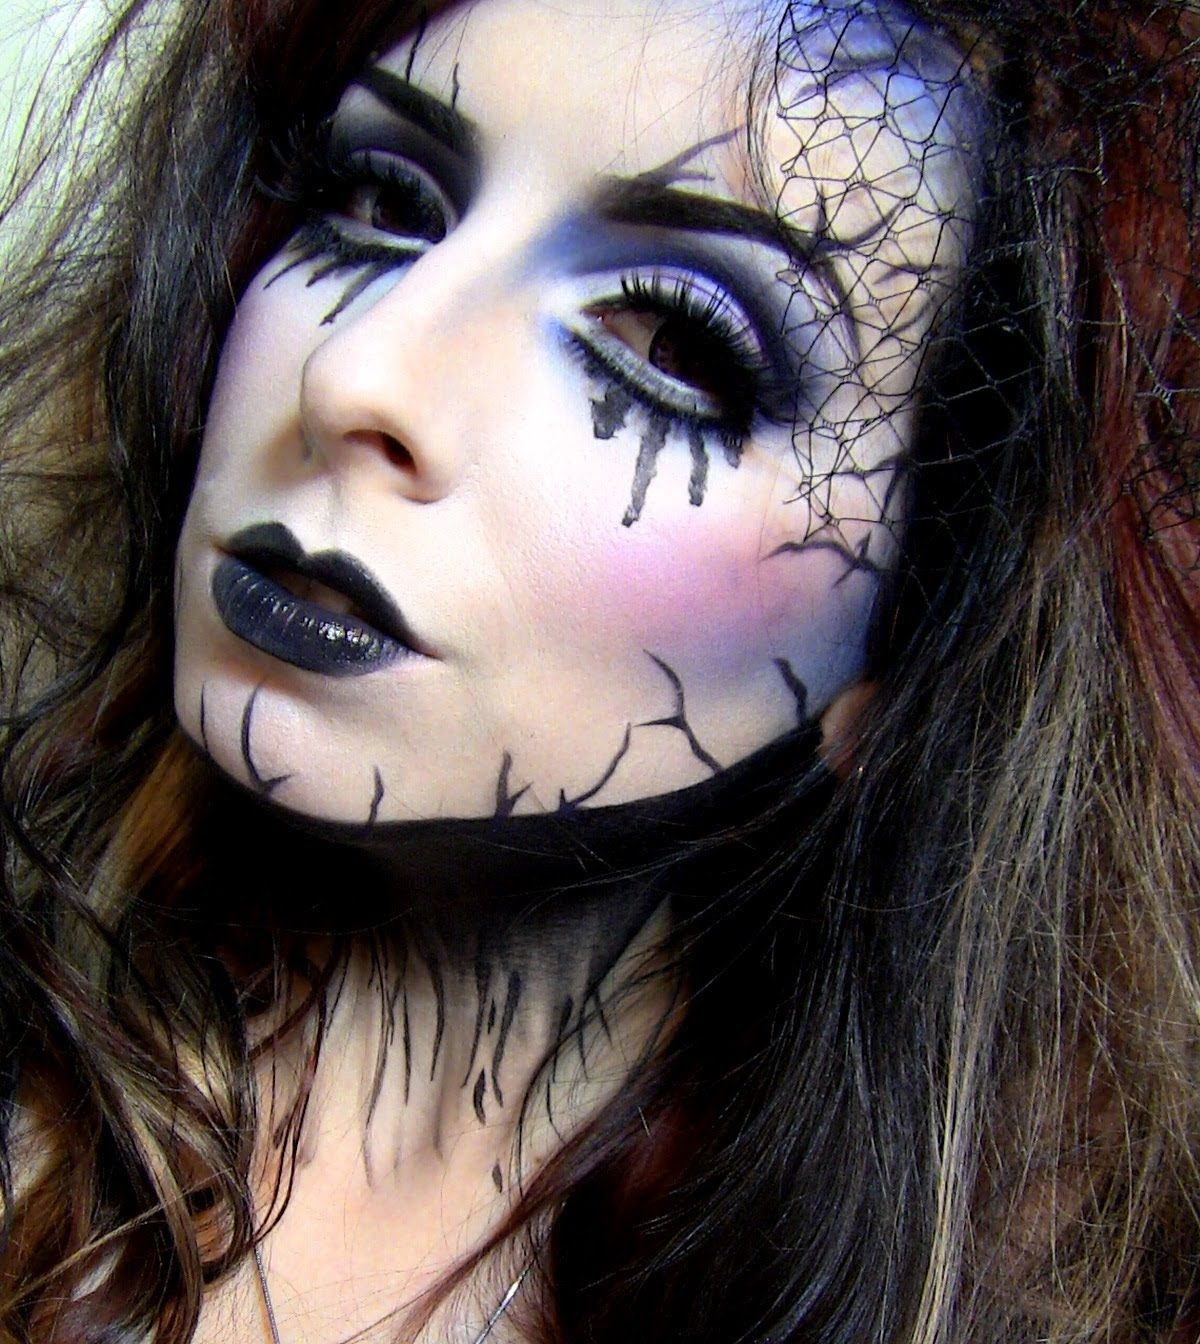 corpse bride make up - Google Search | Beauty | Pinterest | Corpse ...